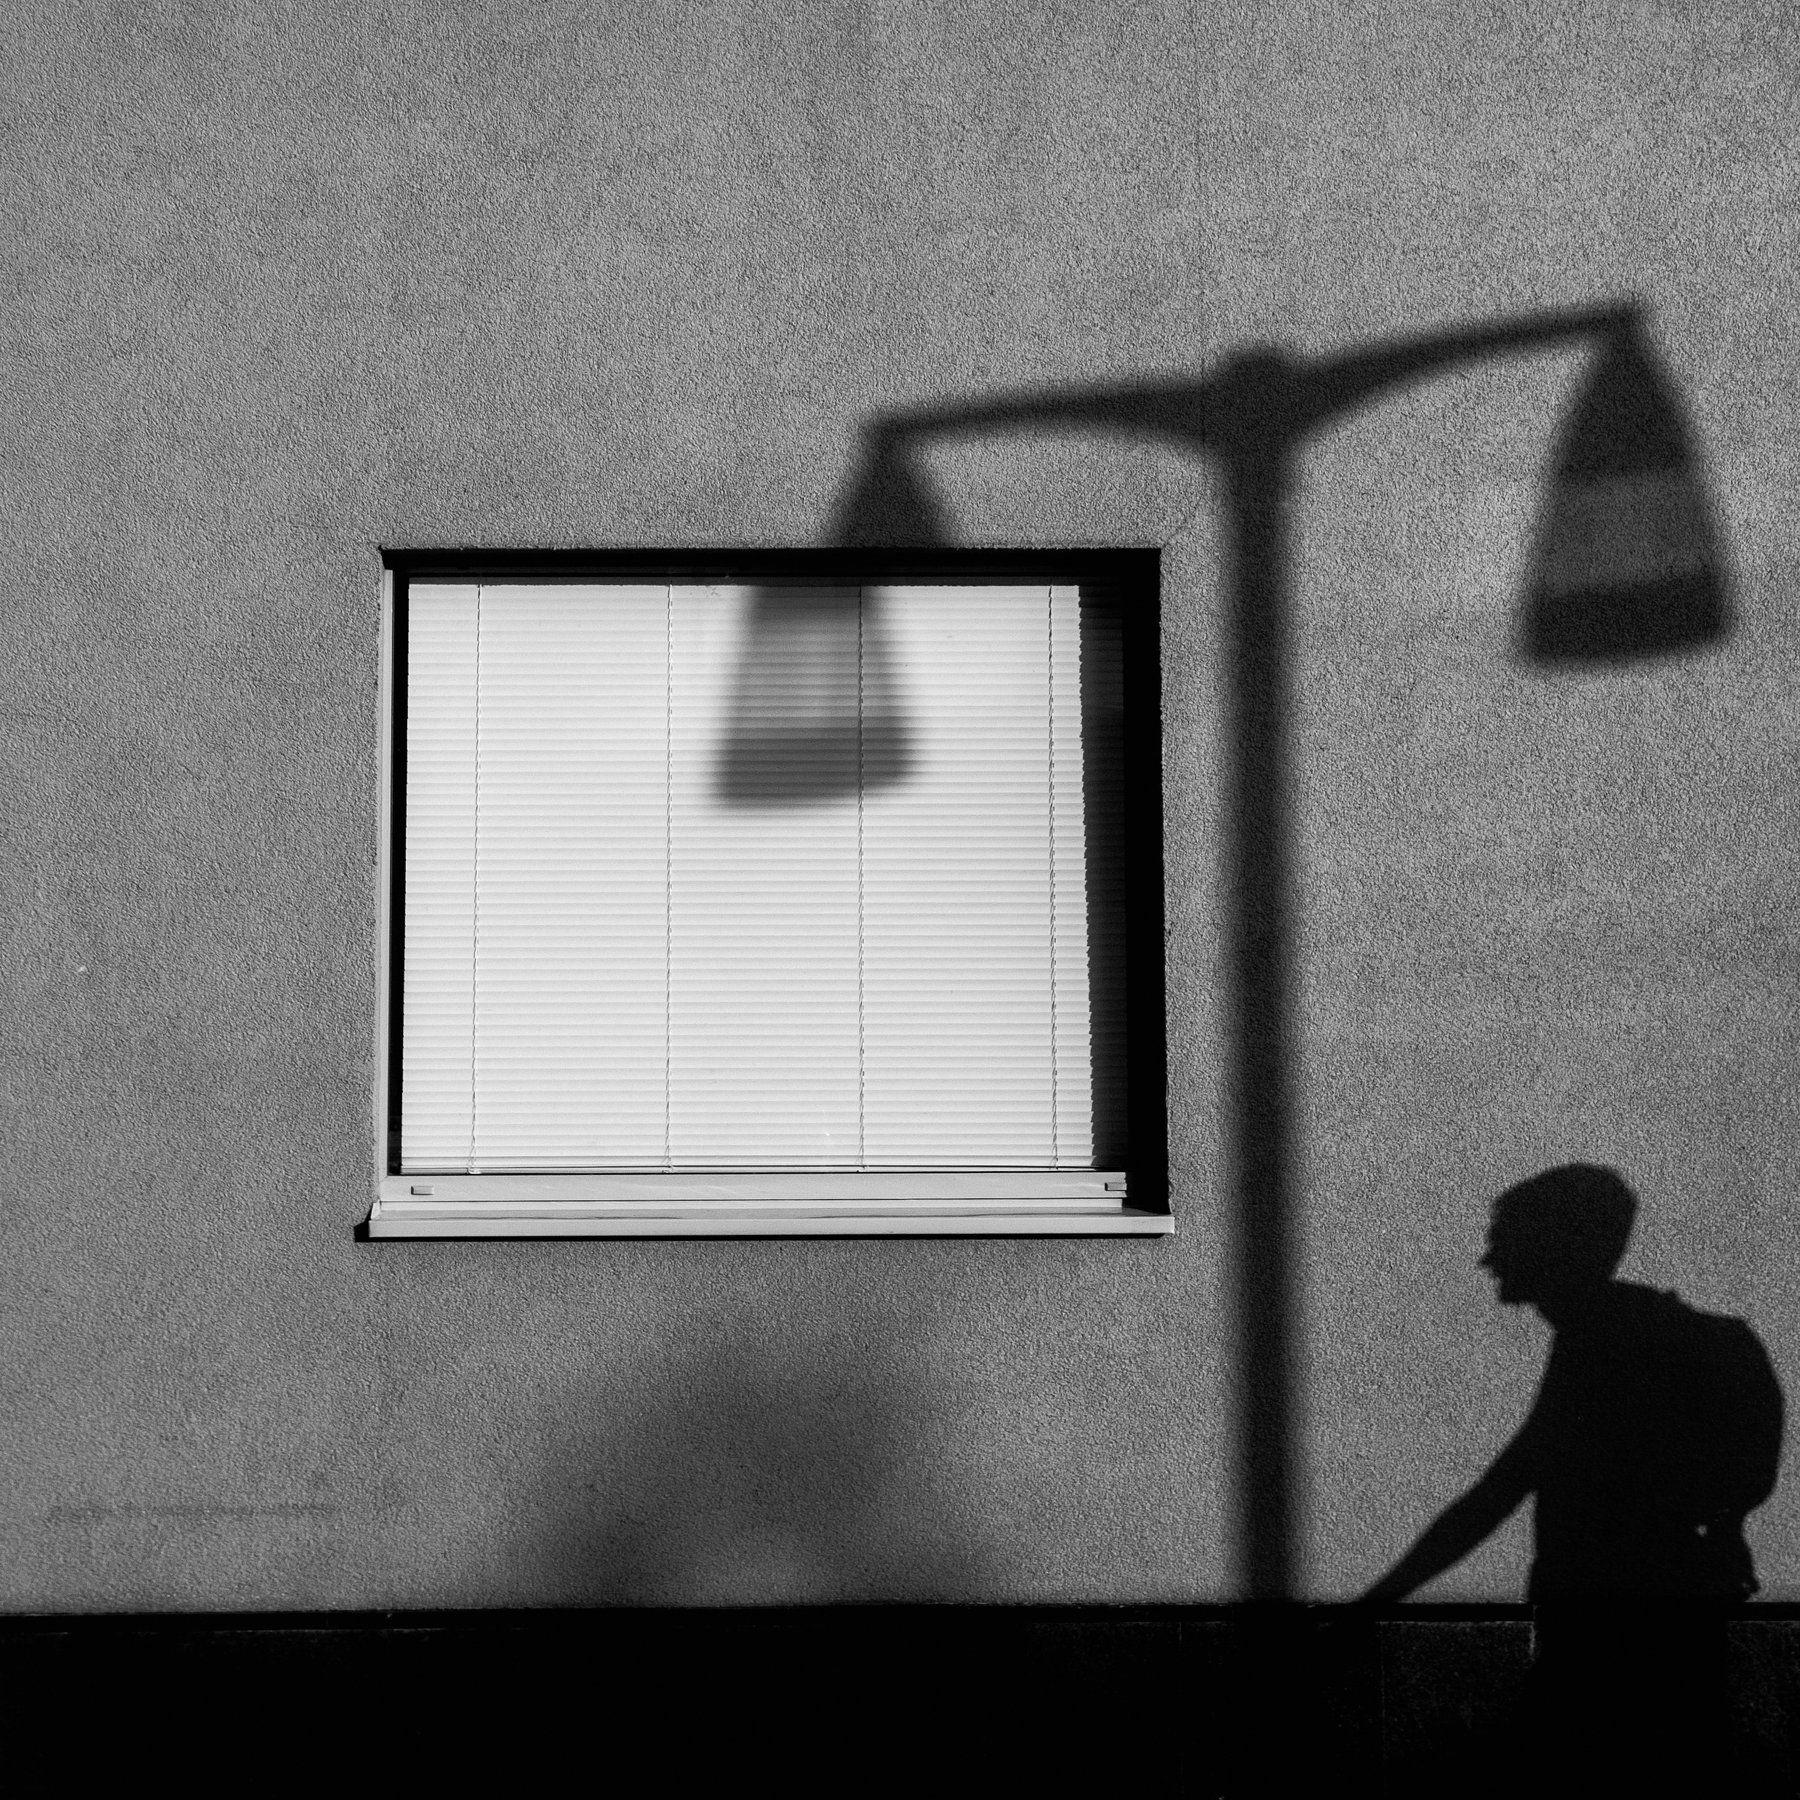 фонарь, тень, мужчина, город, окно, masyaxa